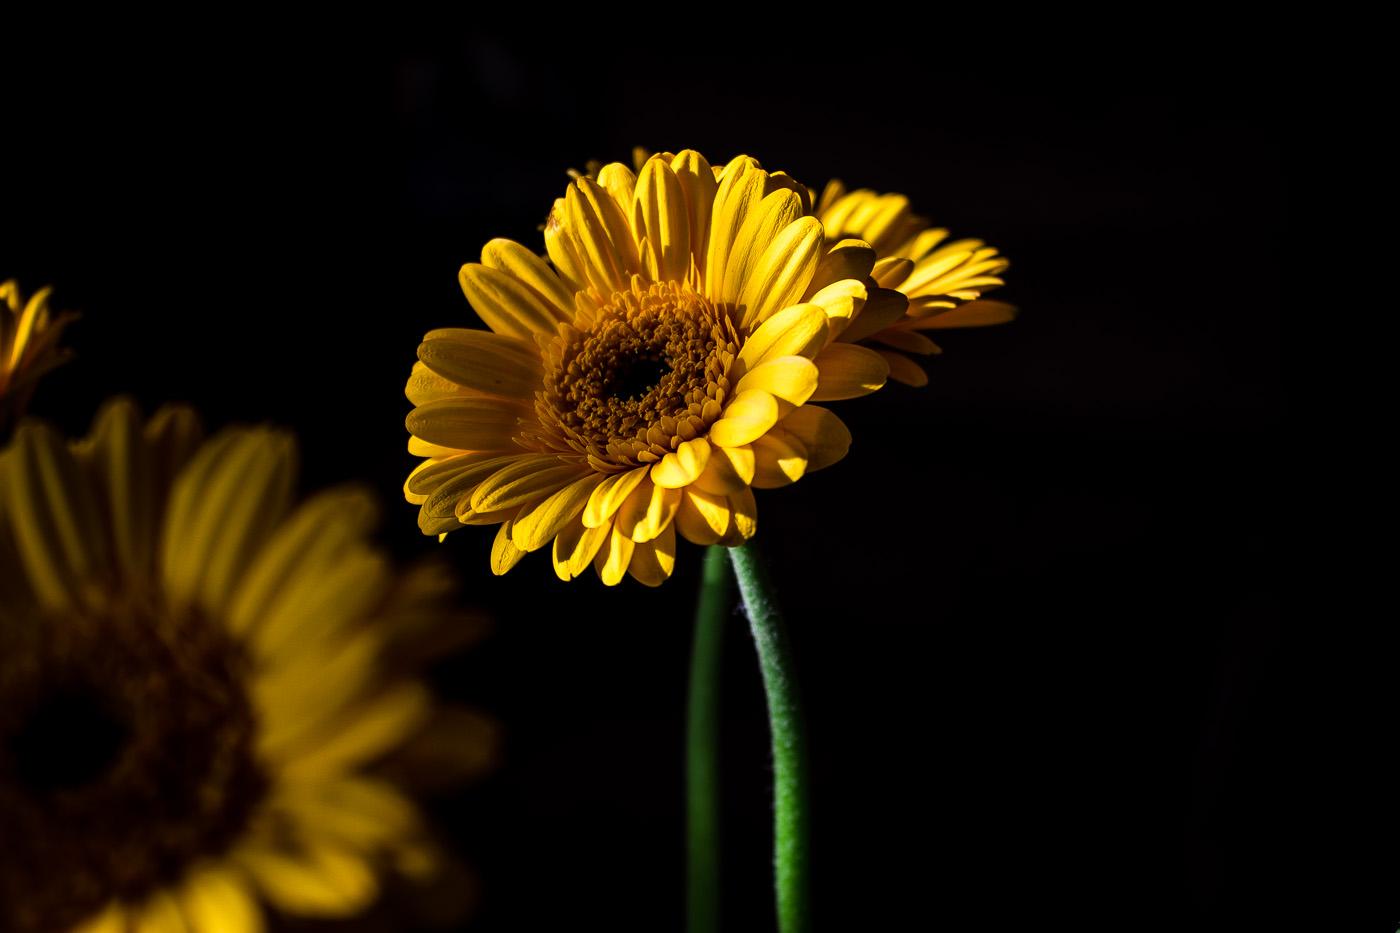 Gerberblume fotografiert mit Canon EOS 600D